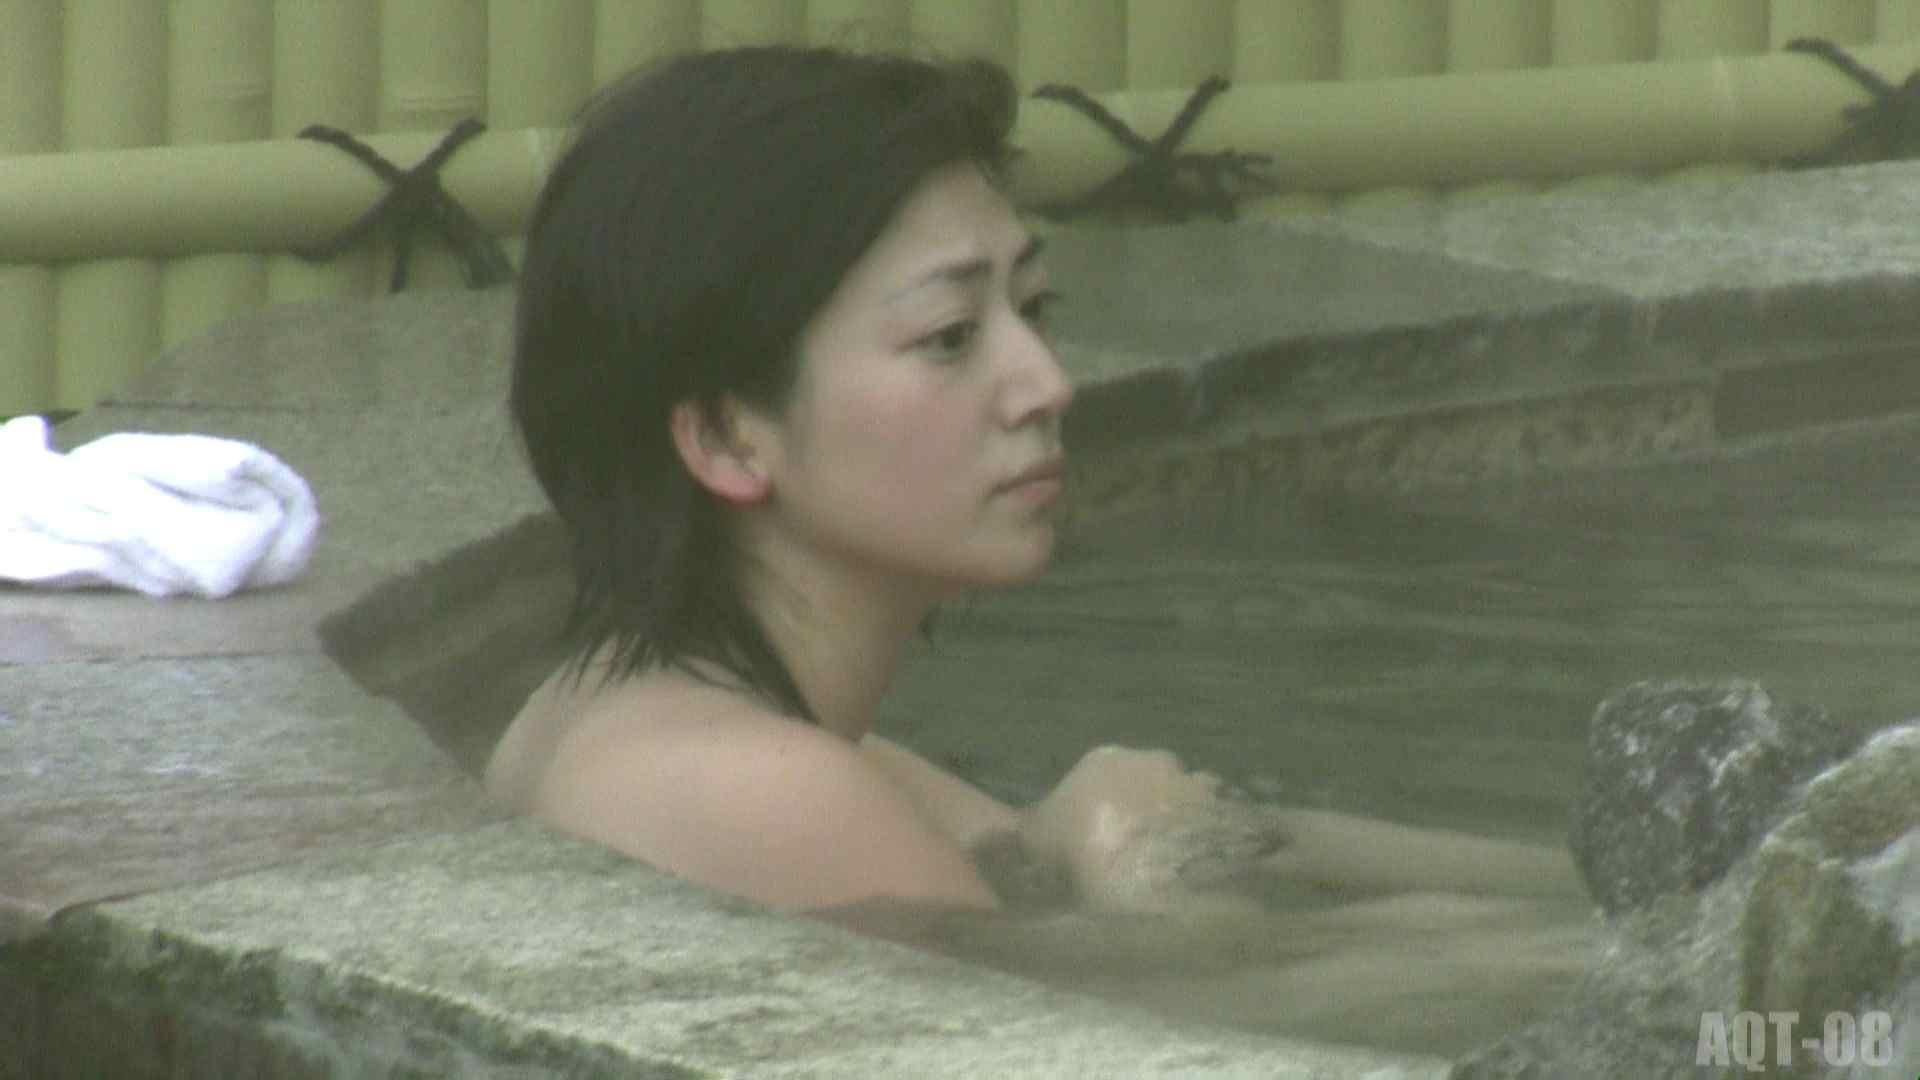 Aquaな露天風呂Vol.776 盗撮 エロ無料画像 108画像 59